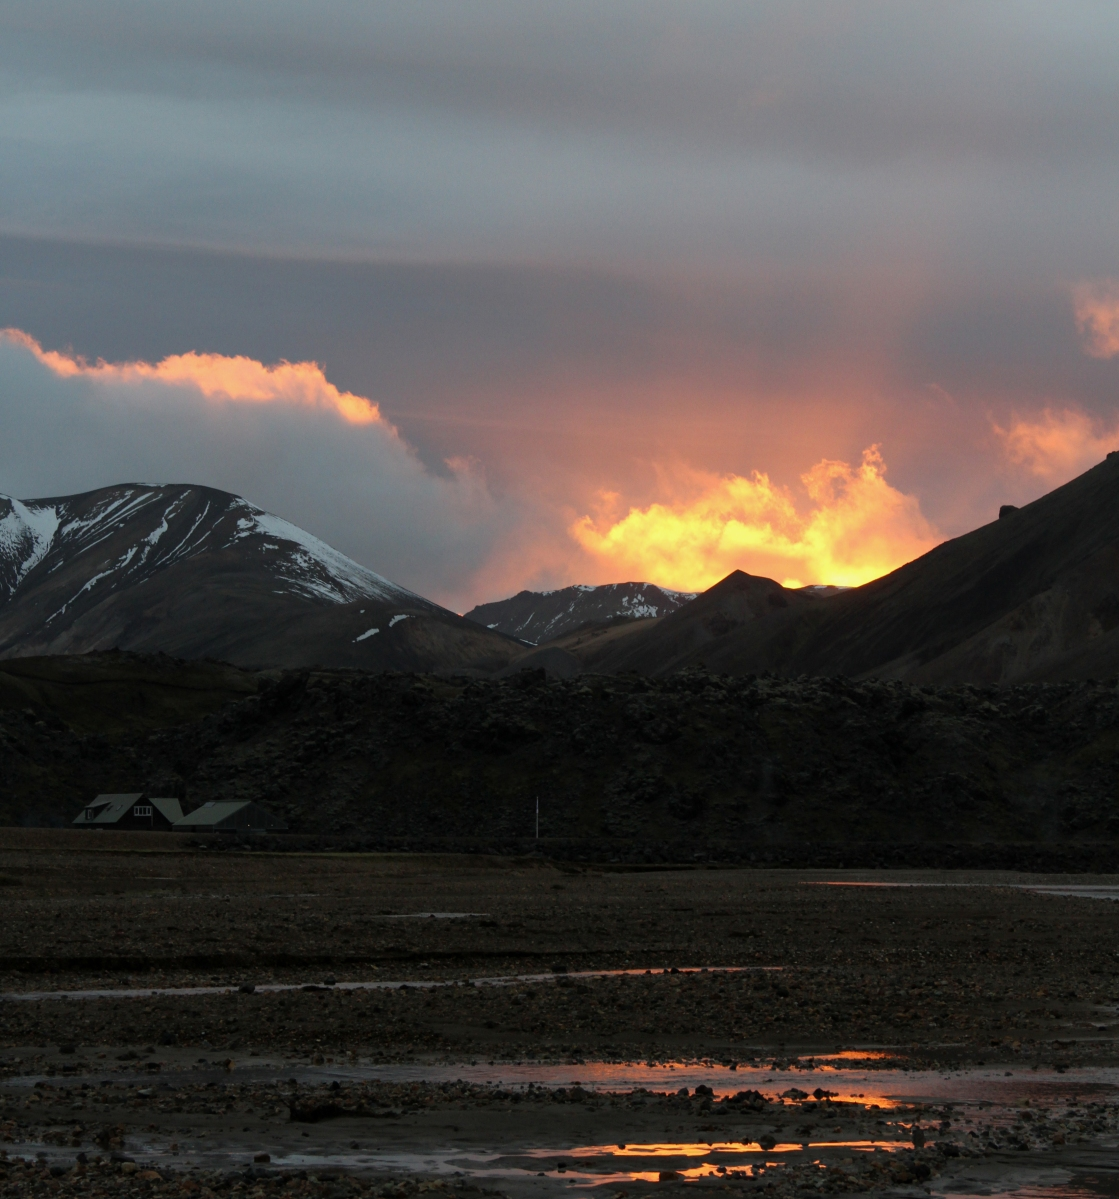 Mini-éruption versus vrai volcan